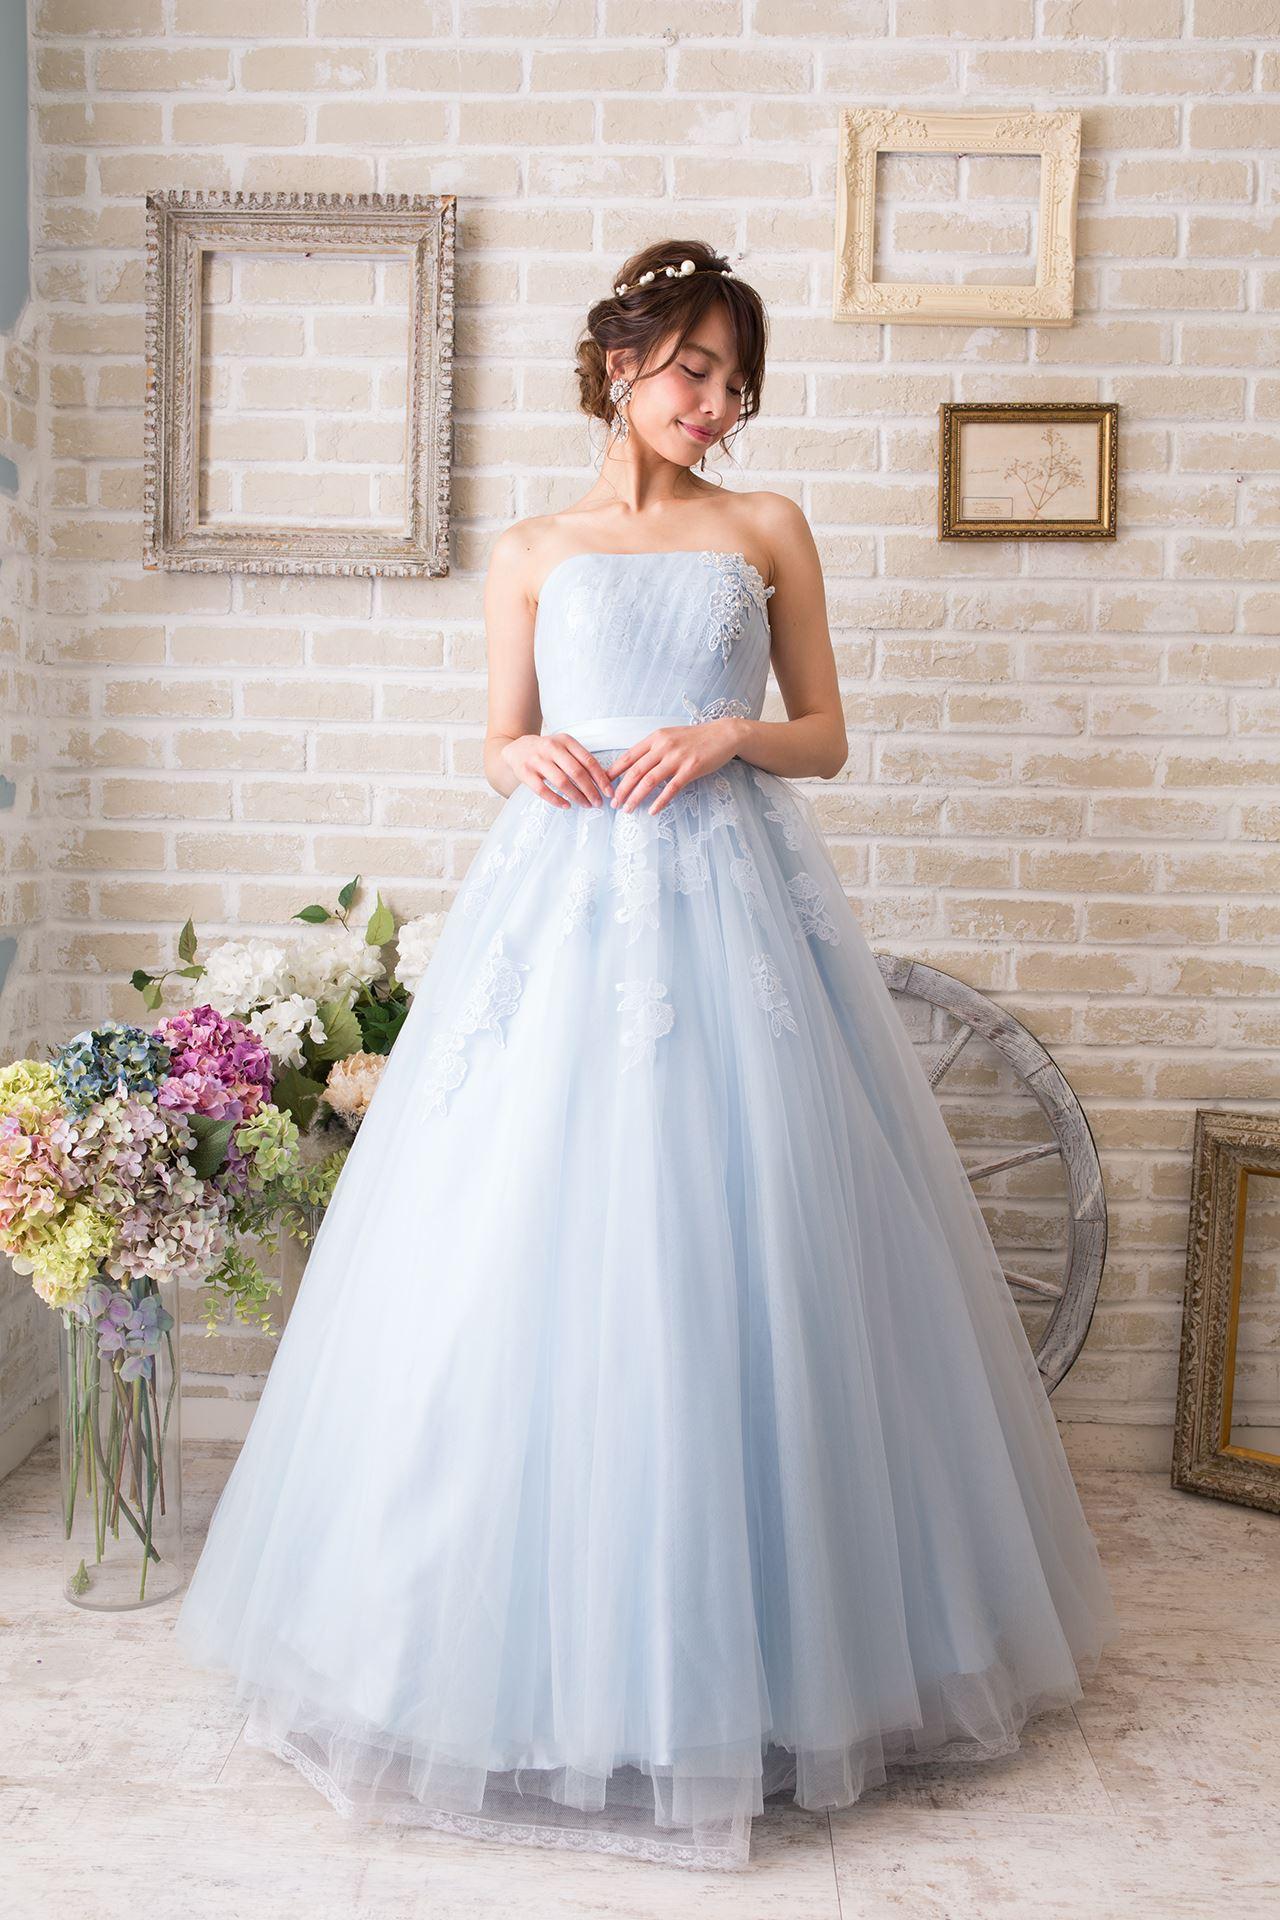 yk_nr_dress_380